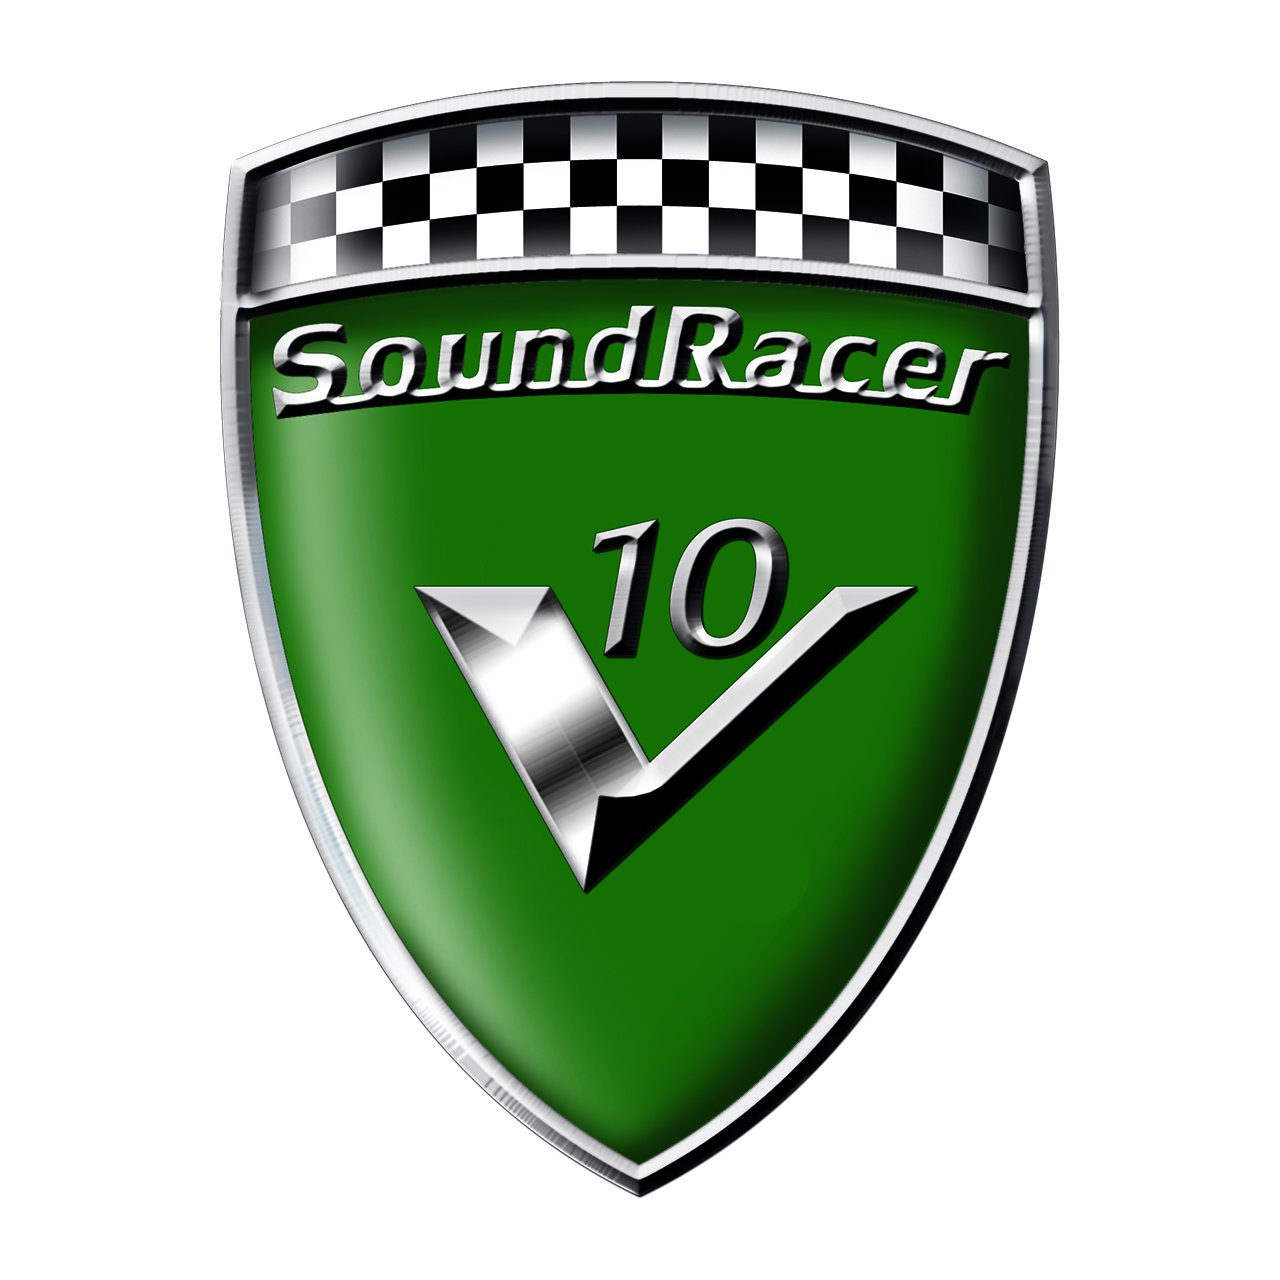 SoundRacer GH-SRV10 - Transmisor FM con pantalla LED: Amazon.es: Coche y moto